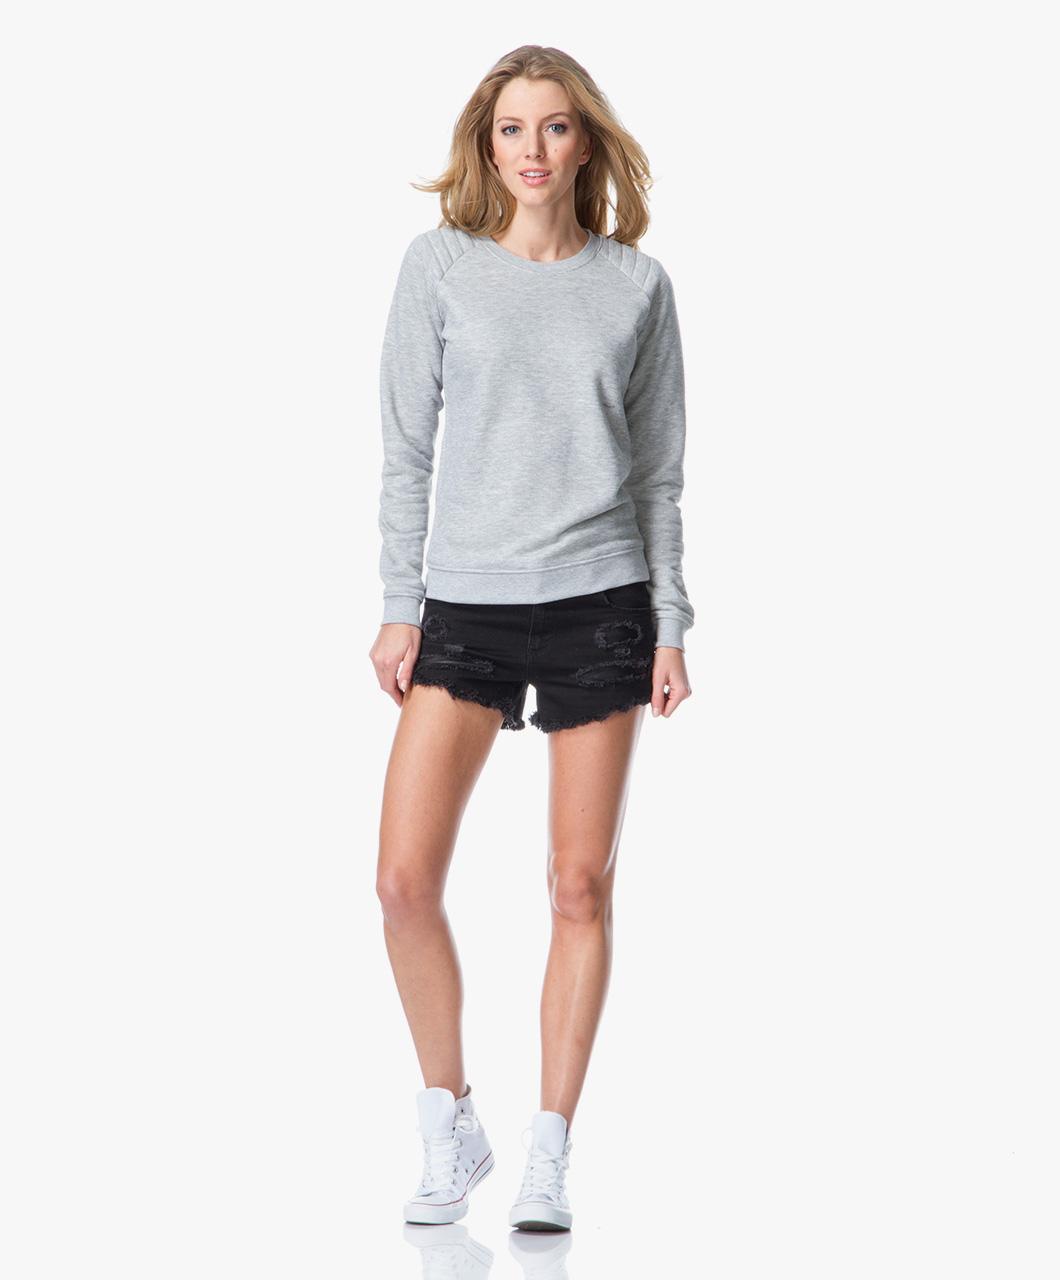 Zoe Karssen Rip'N Roll Boyfriend Shorts - Denim Black - Zoe Karssen